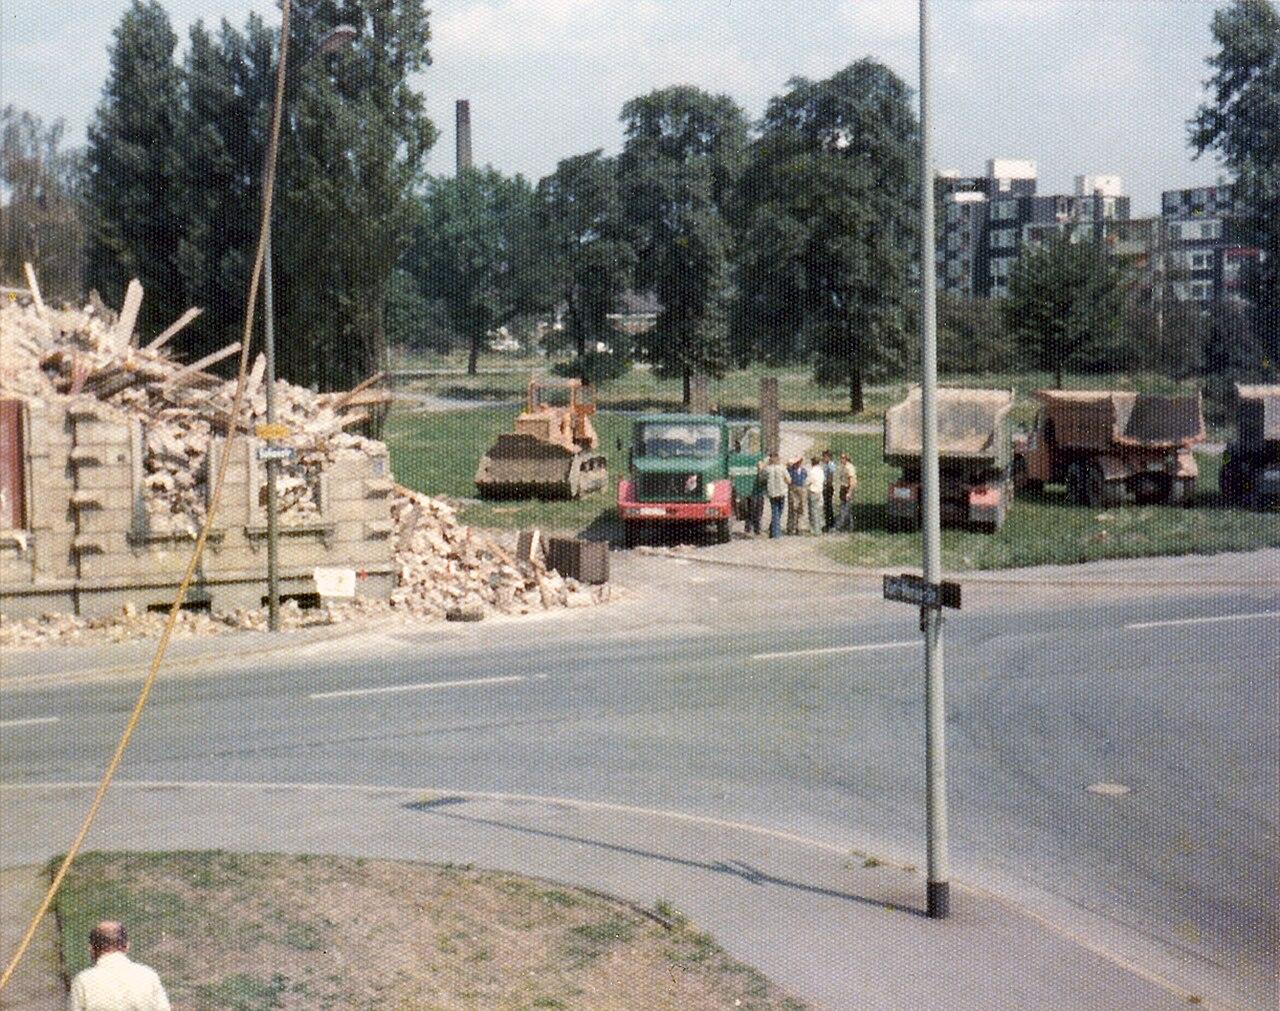 Sofienstraße - Karl-Morian-Straße, Duisburg-Neumühl, etwa 1976.jpg